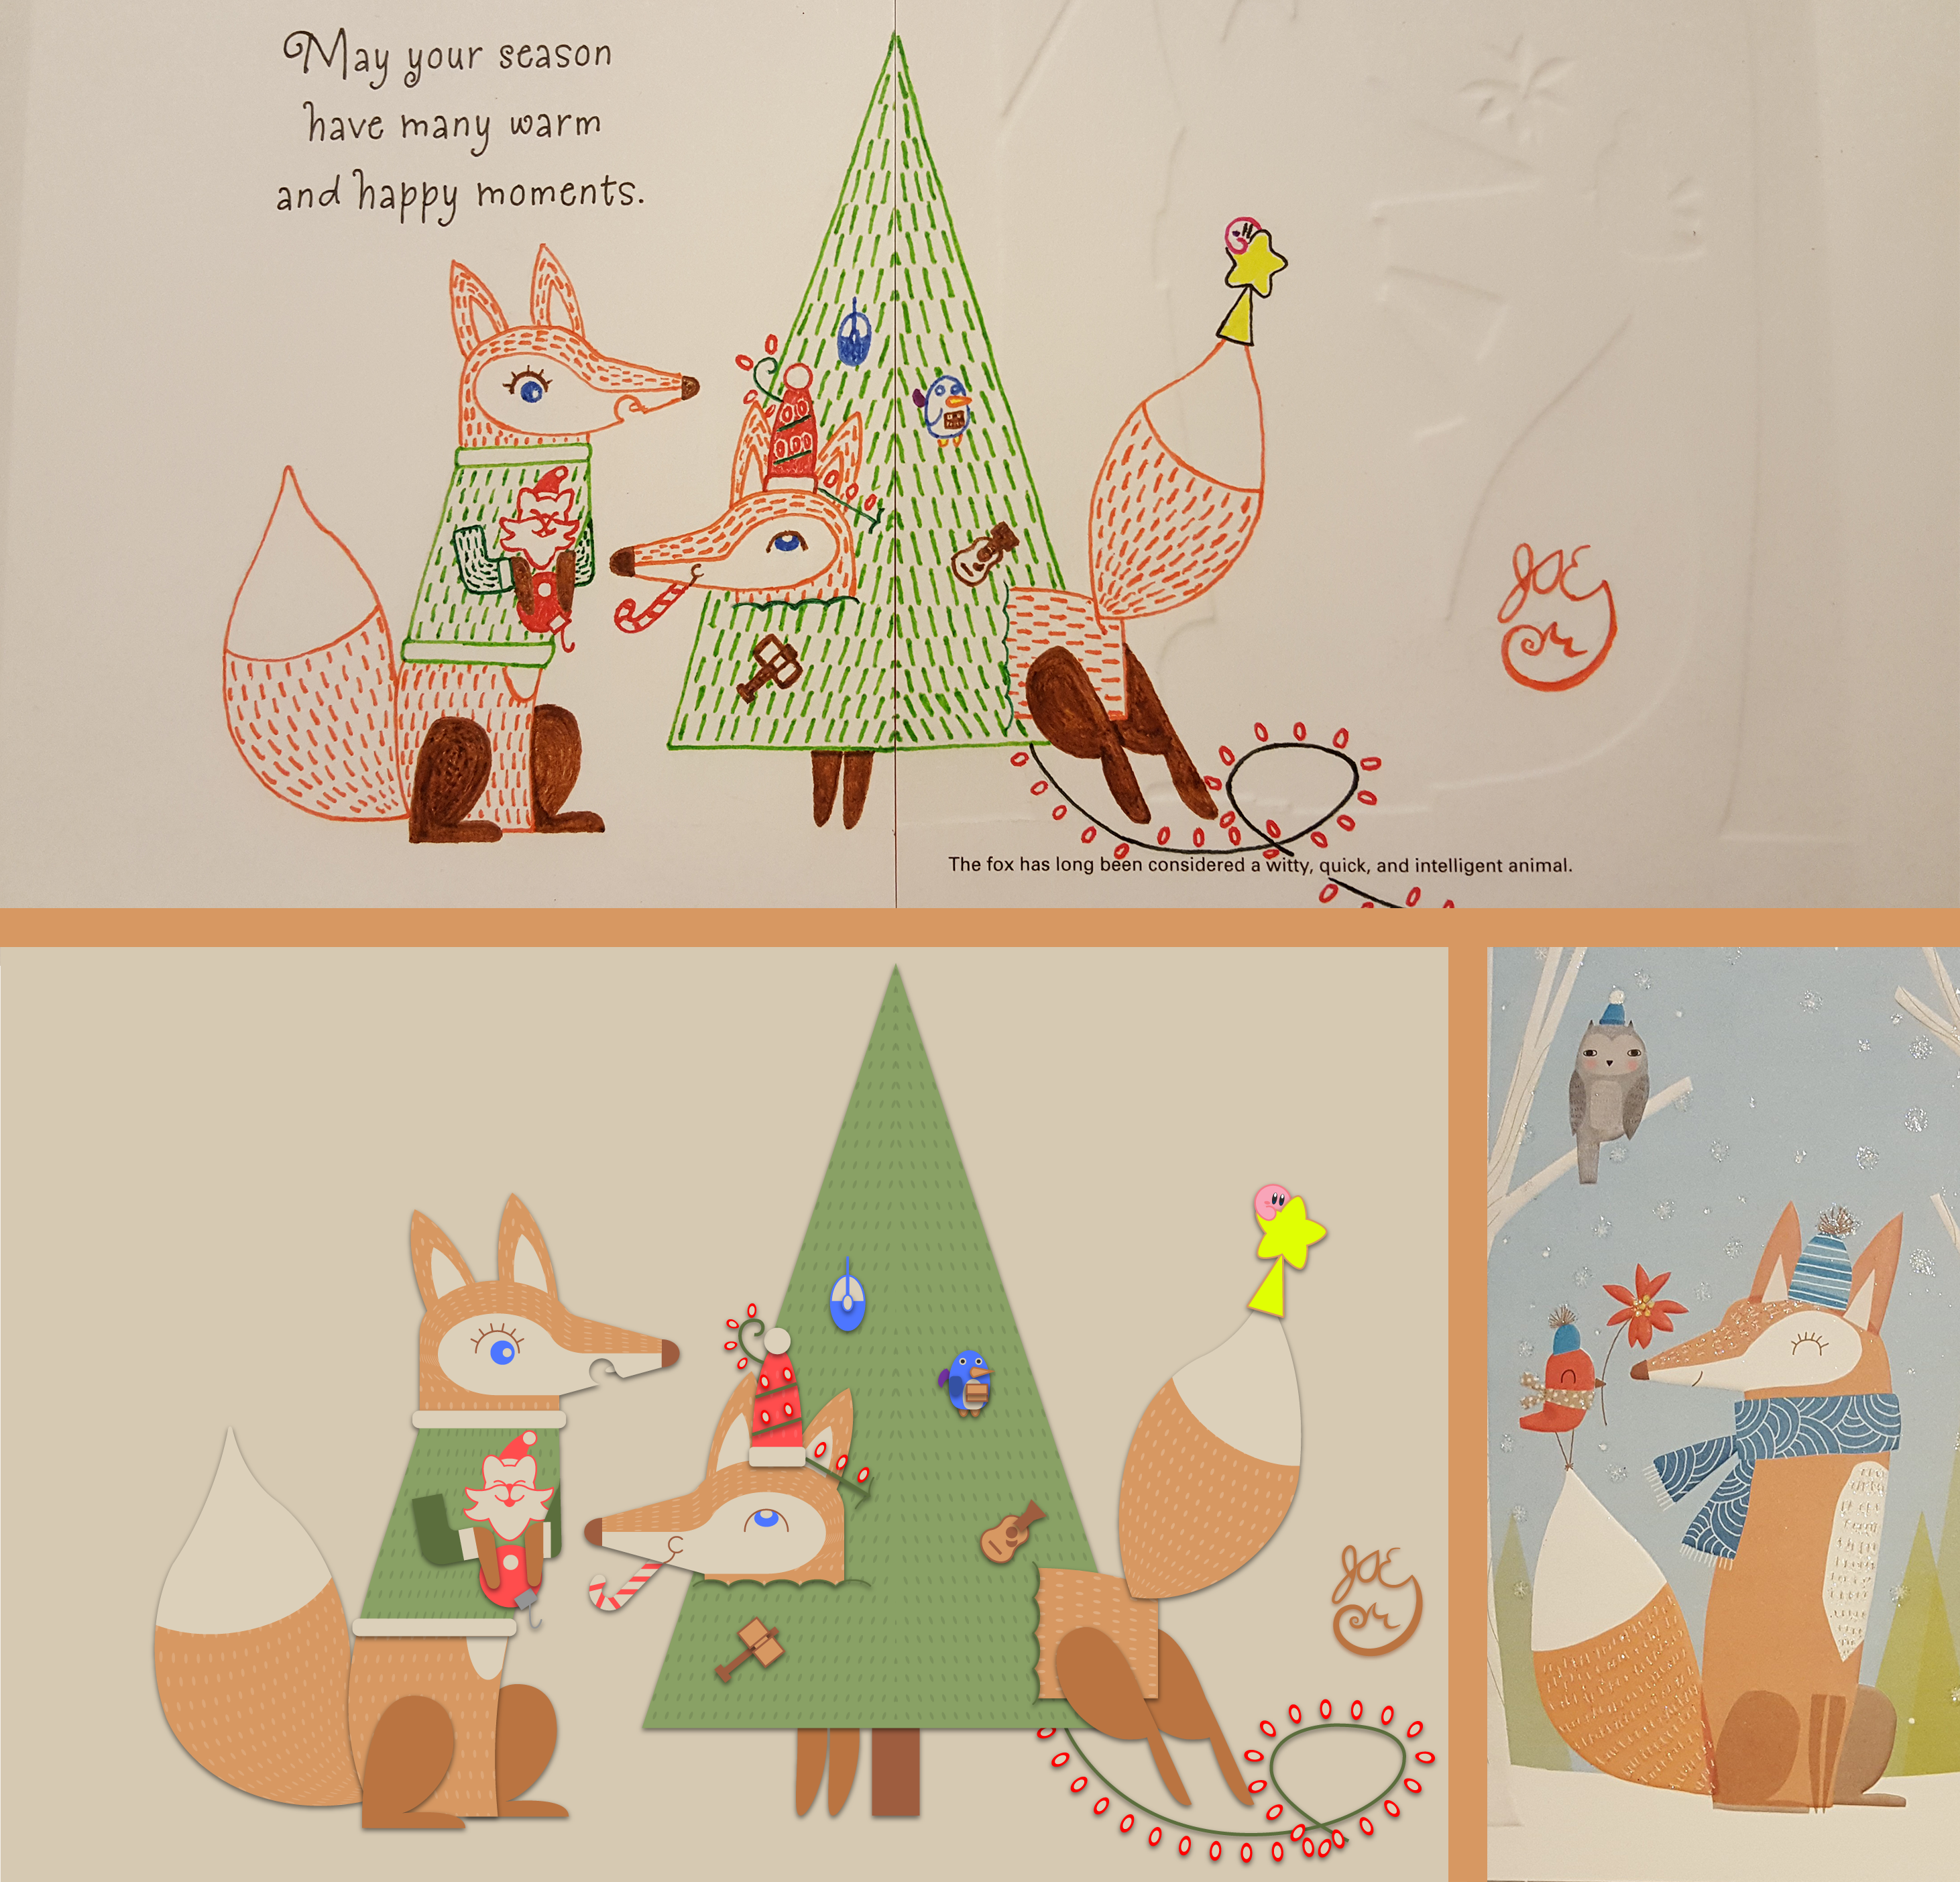 Winter Holiday Card - Fox Couple 3_Vector - 2016